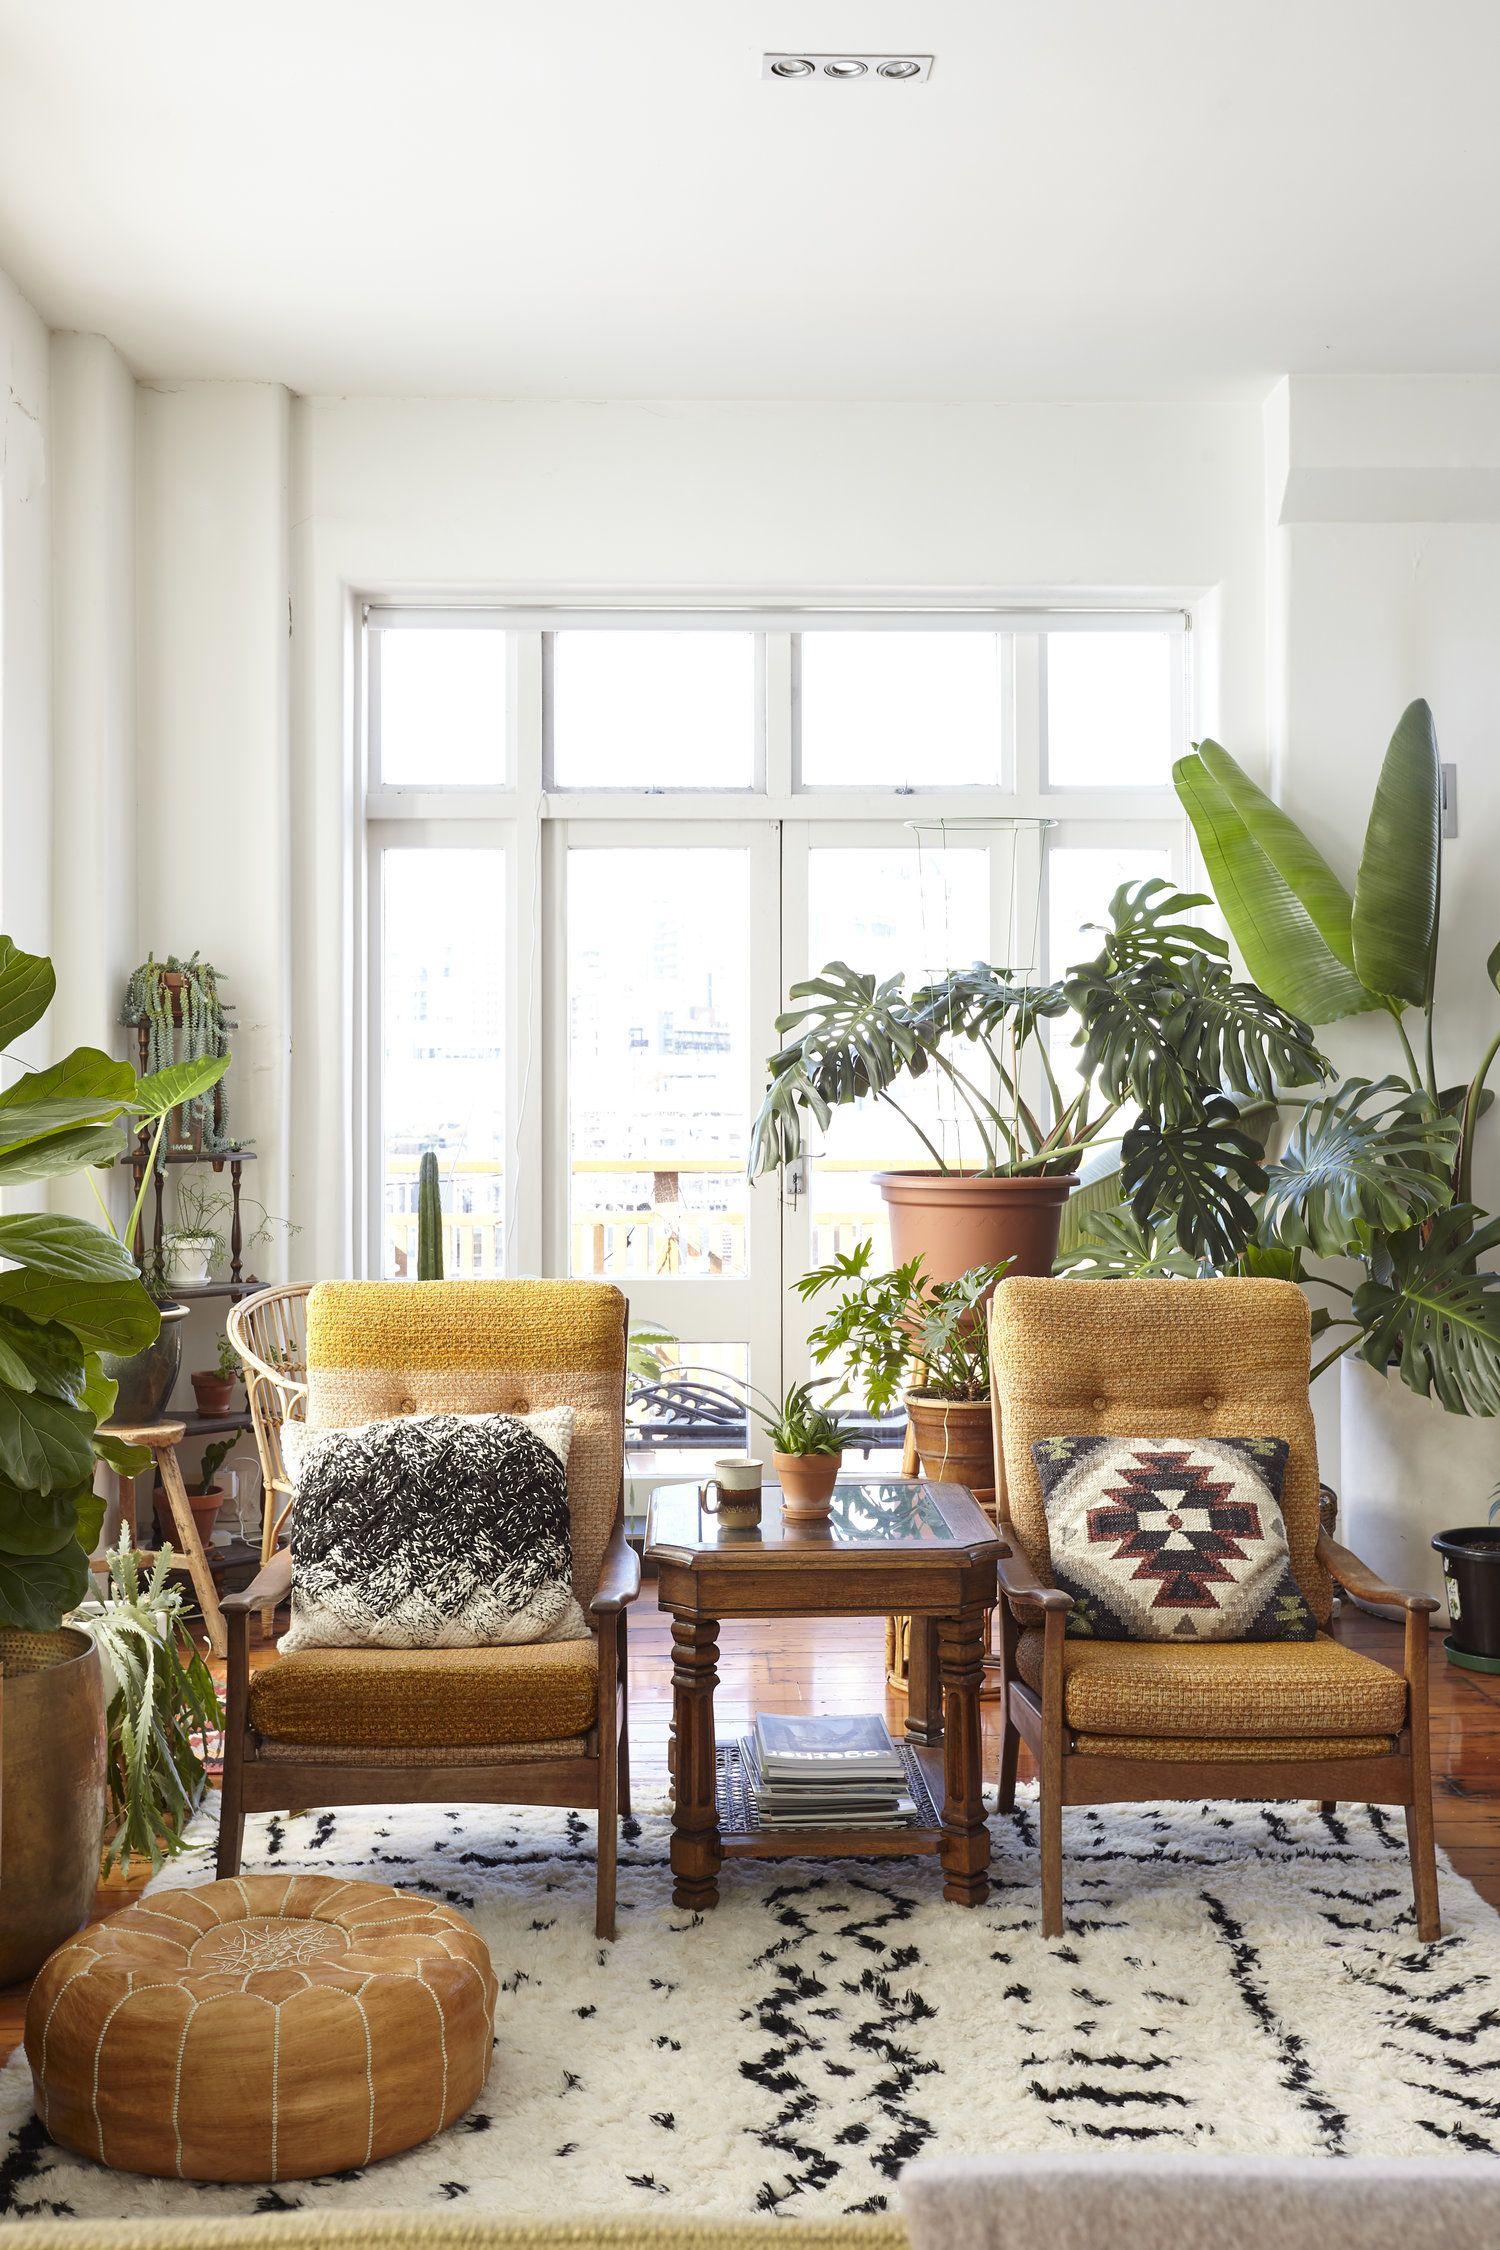 Sneak Peek At Volume 8 91 Magazine Living Room Designs Room Design Bohemian Modern Living Room Sneak peek living room